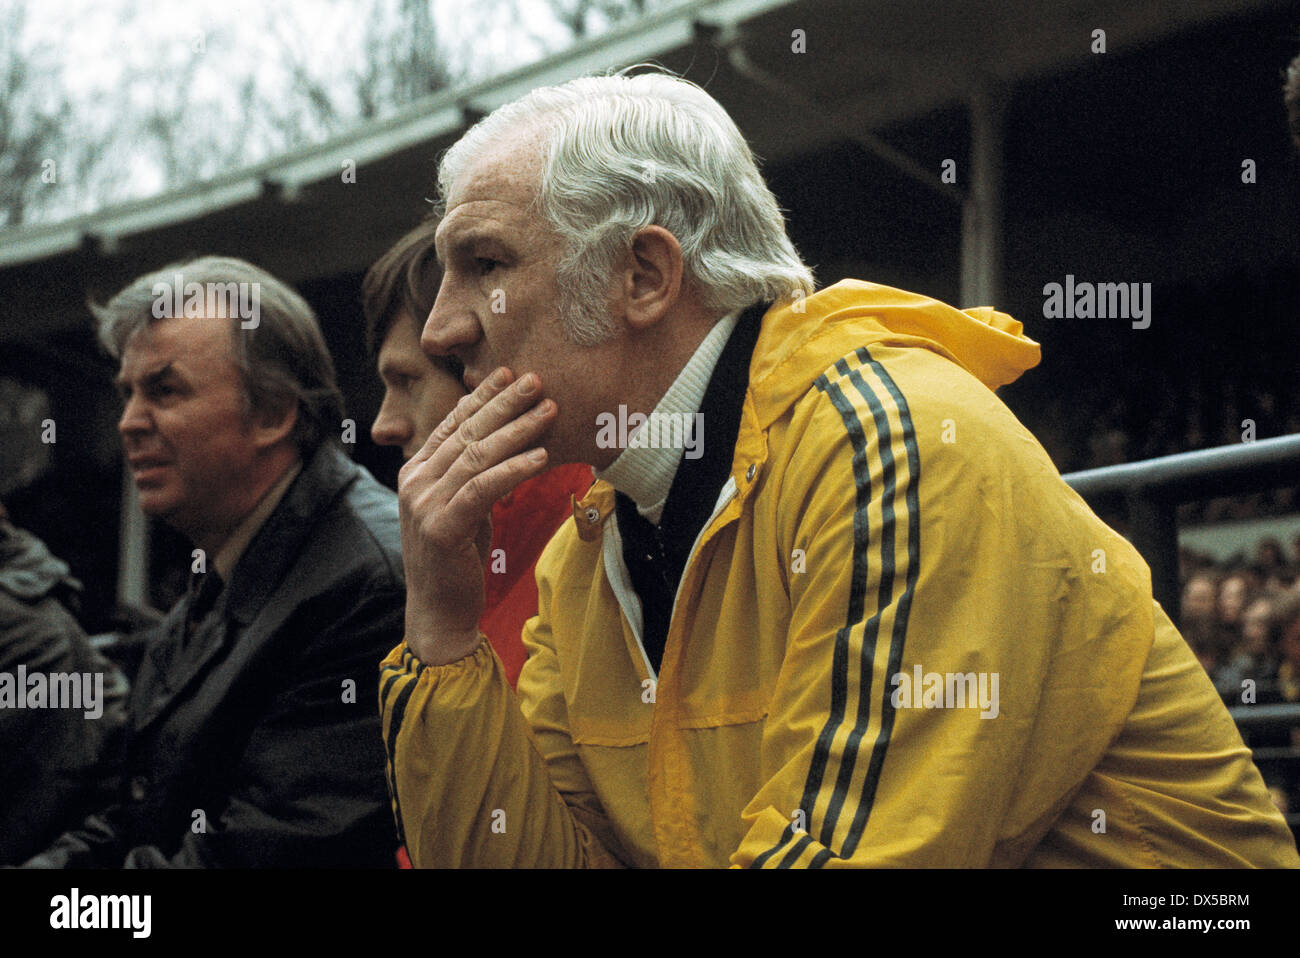 football, Bundesliga, 1974/1975, Radrennbahn Muengersdorf, 1. FC Cologne versus Hertha BSC Berlin 2:1, coach Georg Kessler (Hertha) on the coaching bench - Stock Image